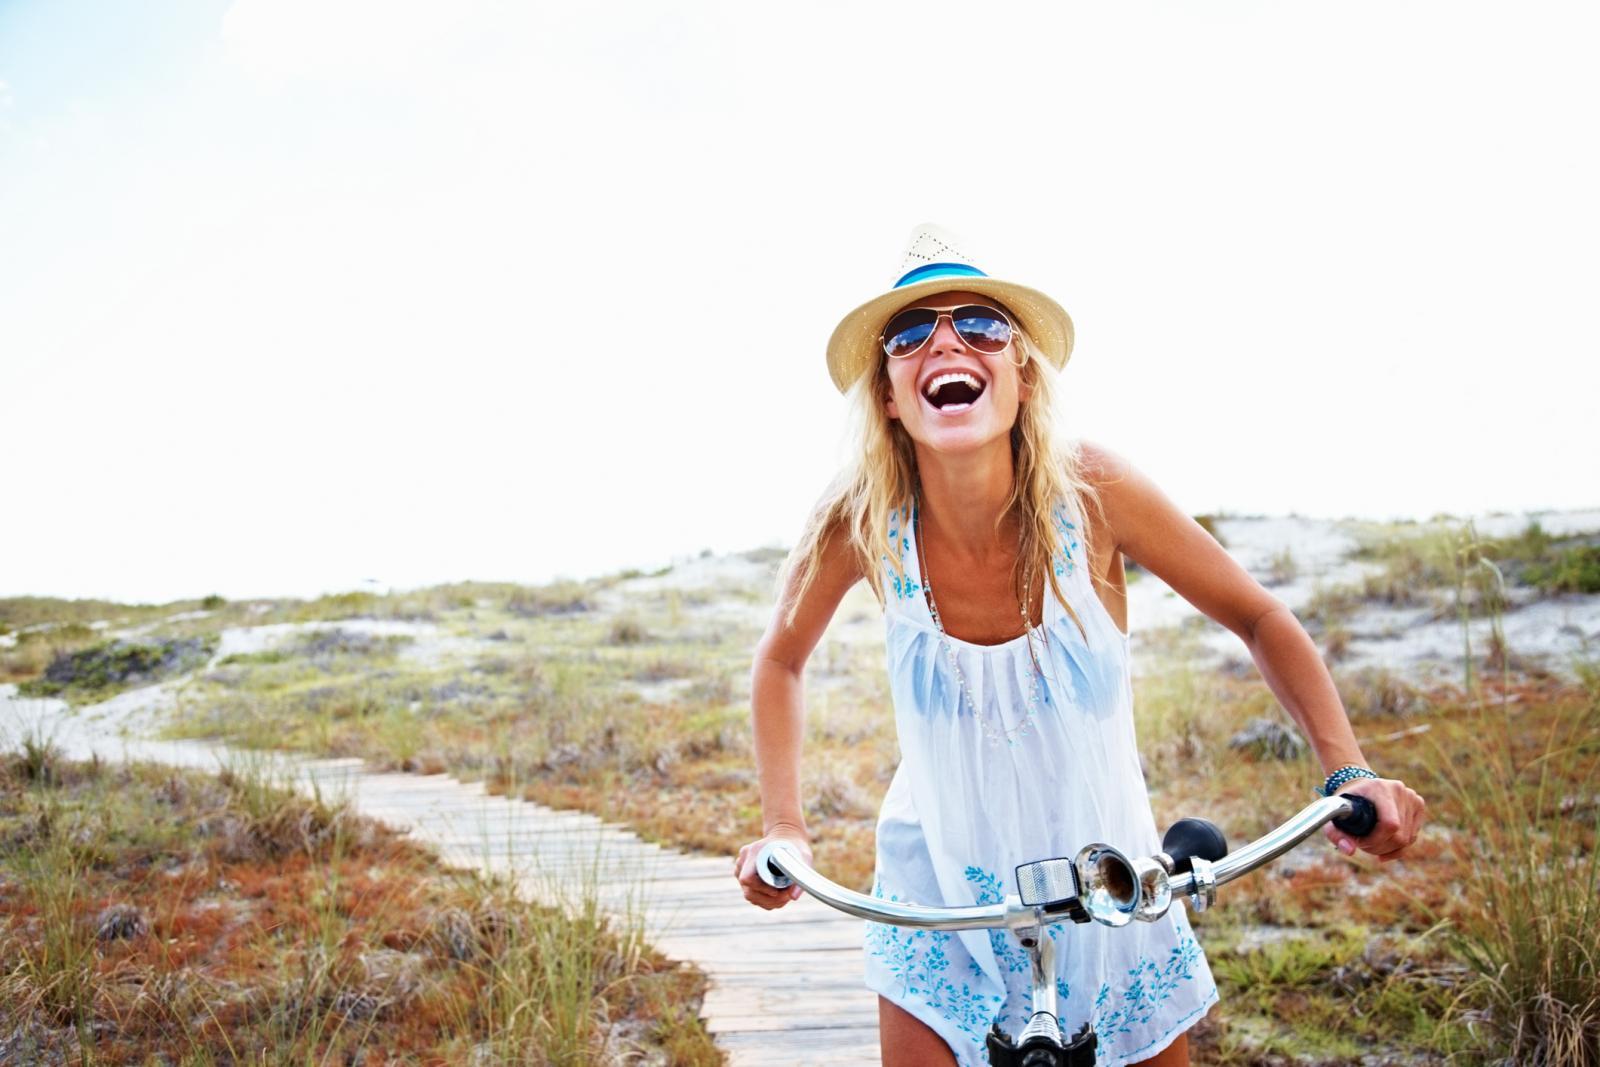 Fizička aktivnost na dva kotača odličan je trening i idealan način za održavanje srca i krvnih žila u dobroj formi.